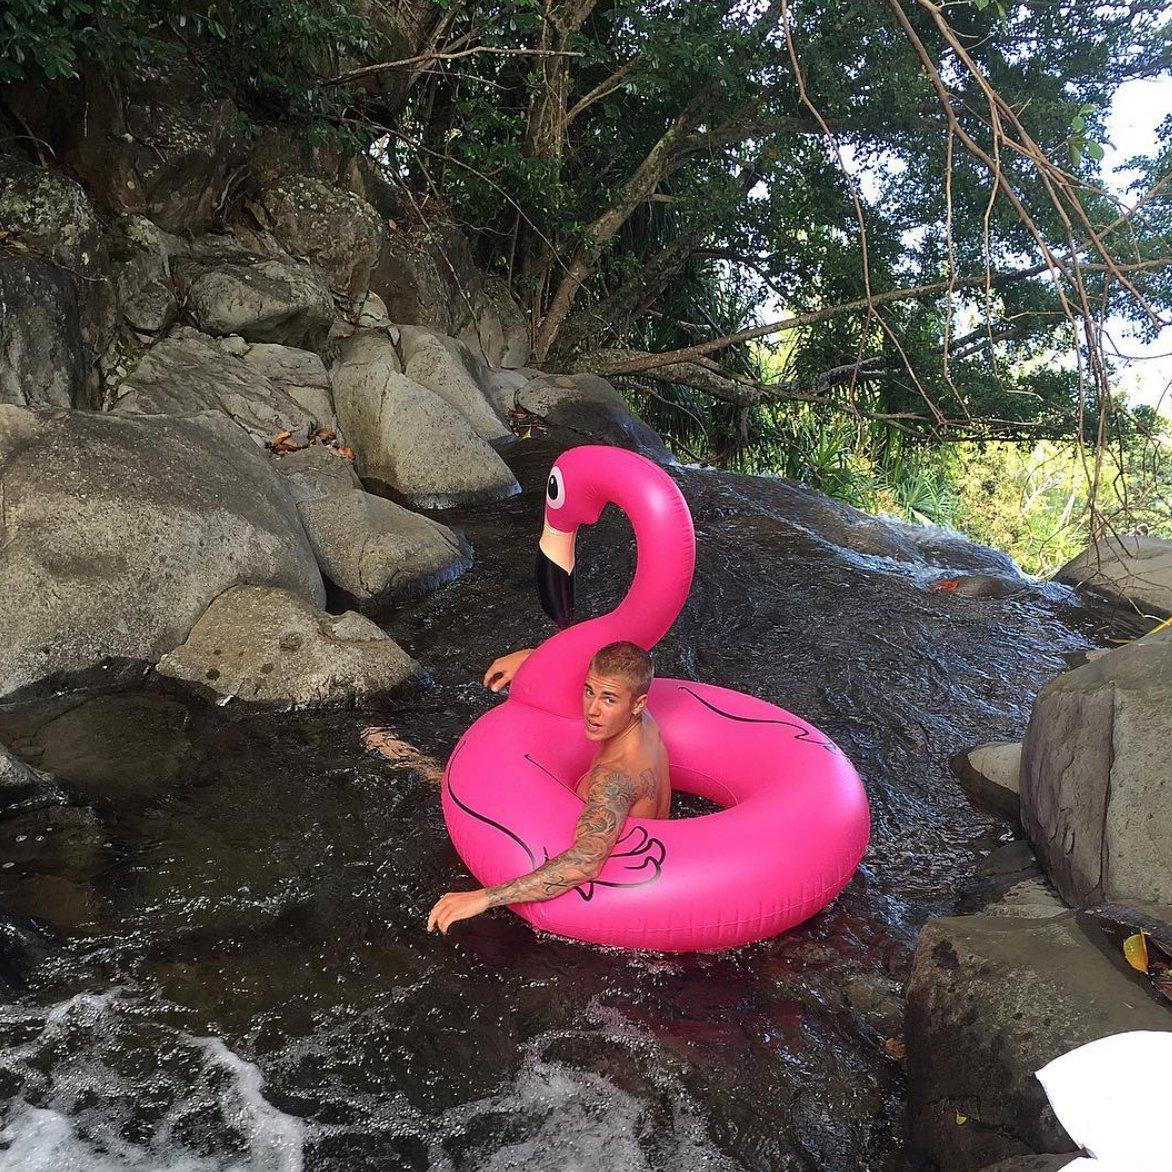 RT if you wish you were that swan. #Beliebers #BestFanArmy #iHeartAwards